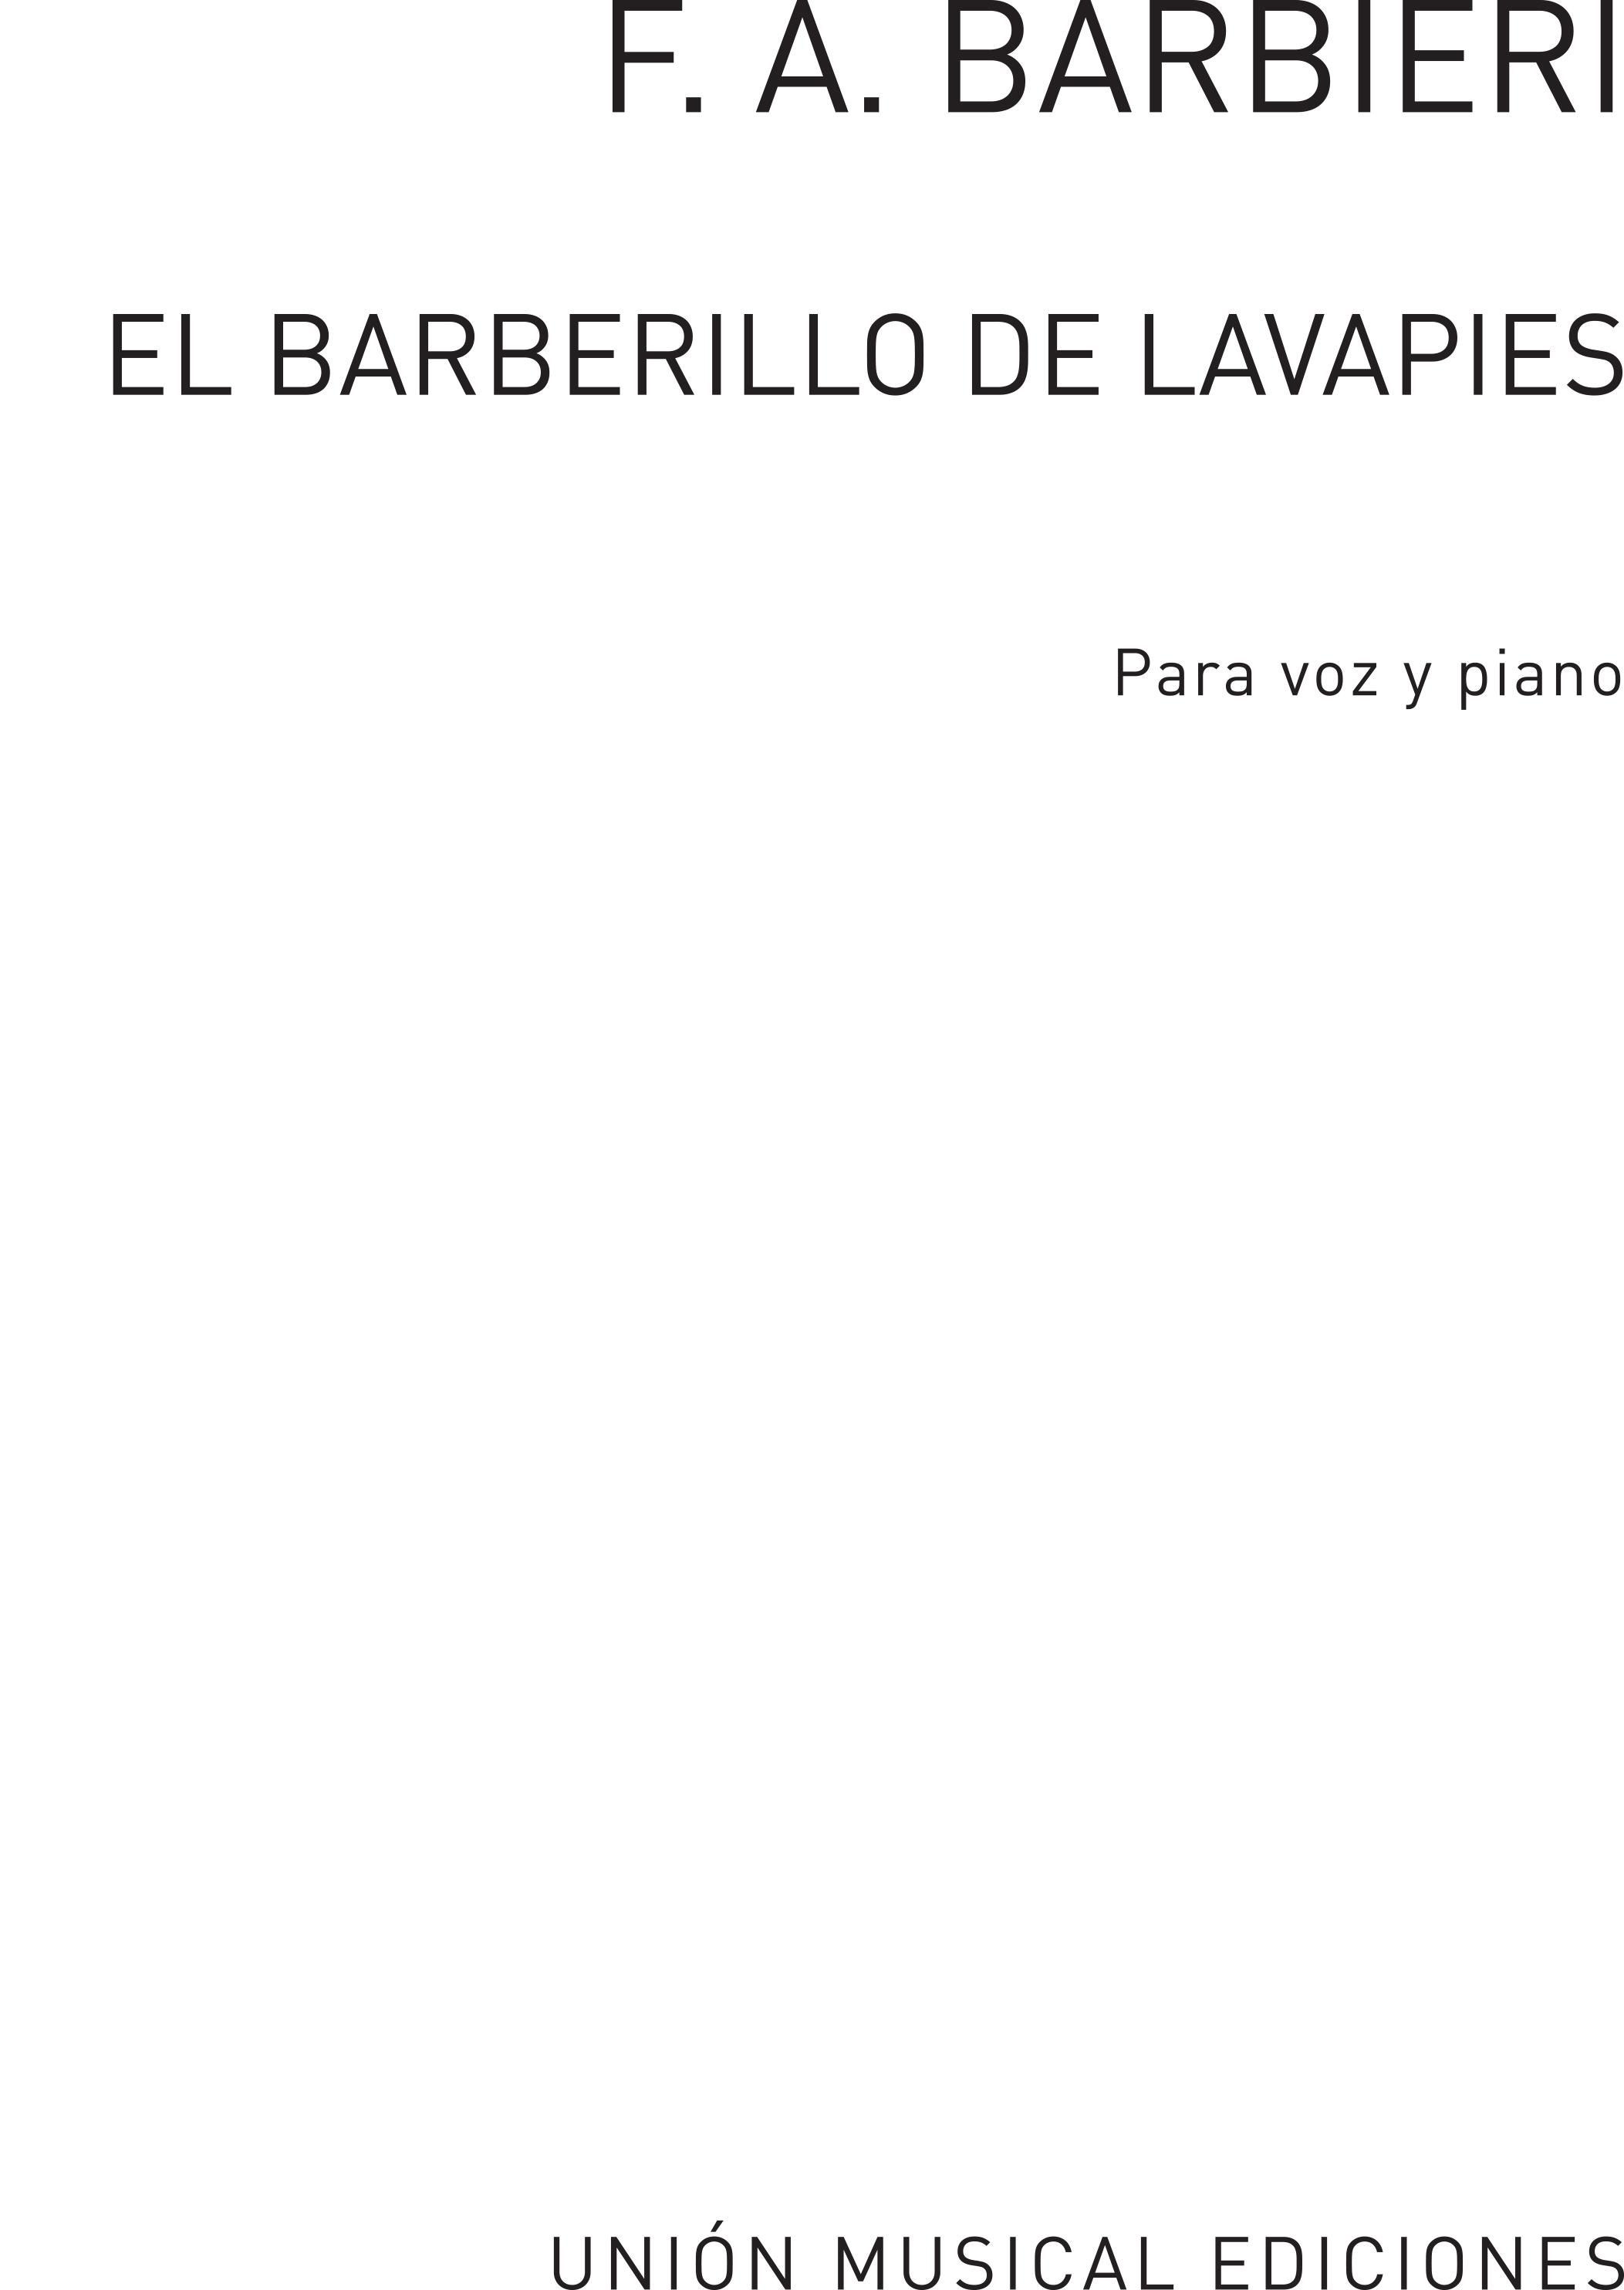 F.A. Barbieri: El Barberillo De Lavapies Vocal Score: Opera: Vocal Score